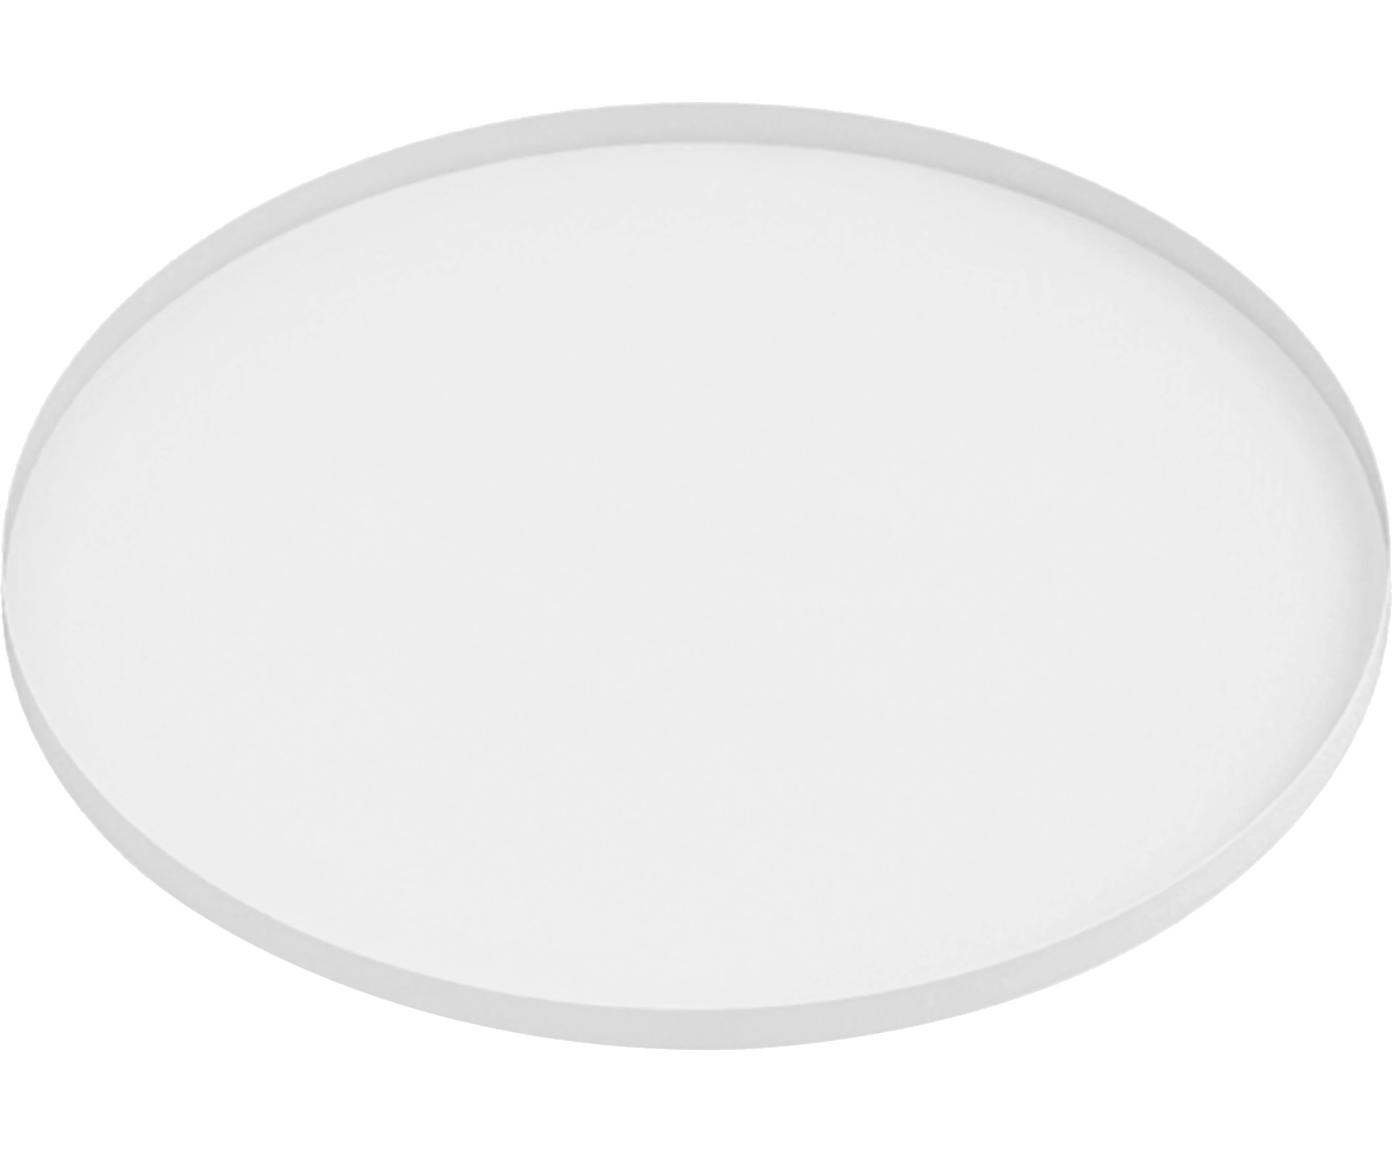 Bandeja Arla, Metal recubierto, Blanco, Ø 41 cm